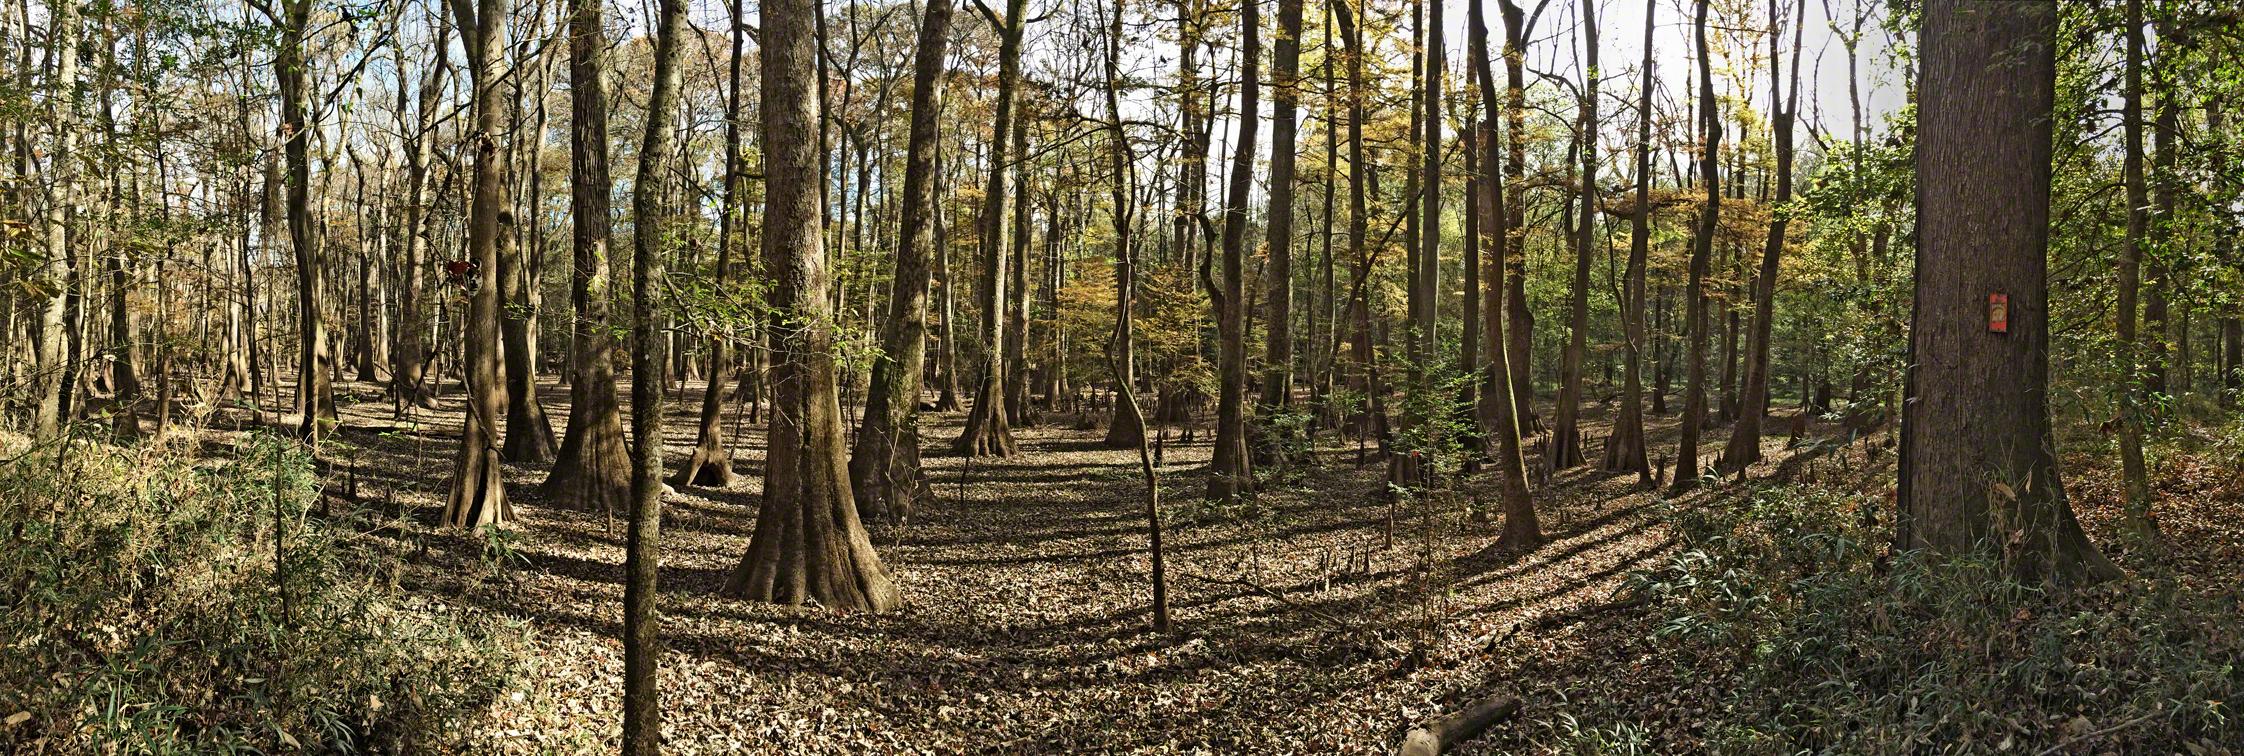 cypress slough panorama